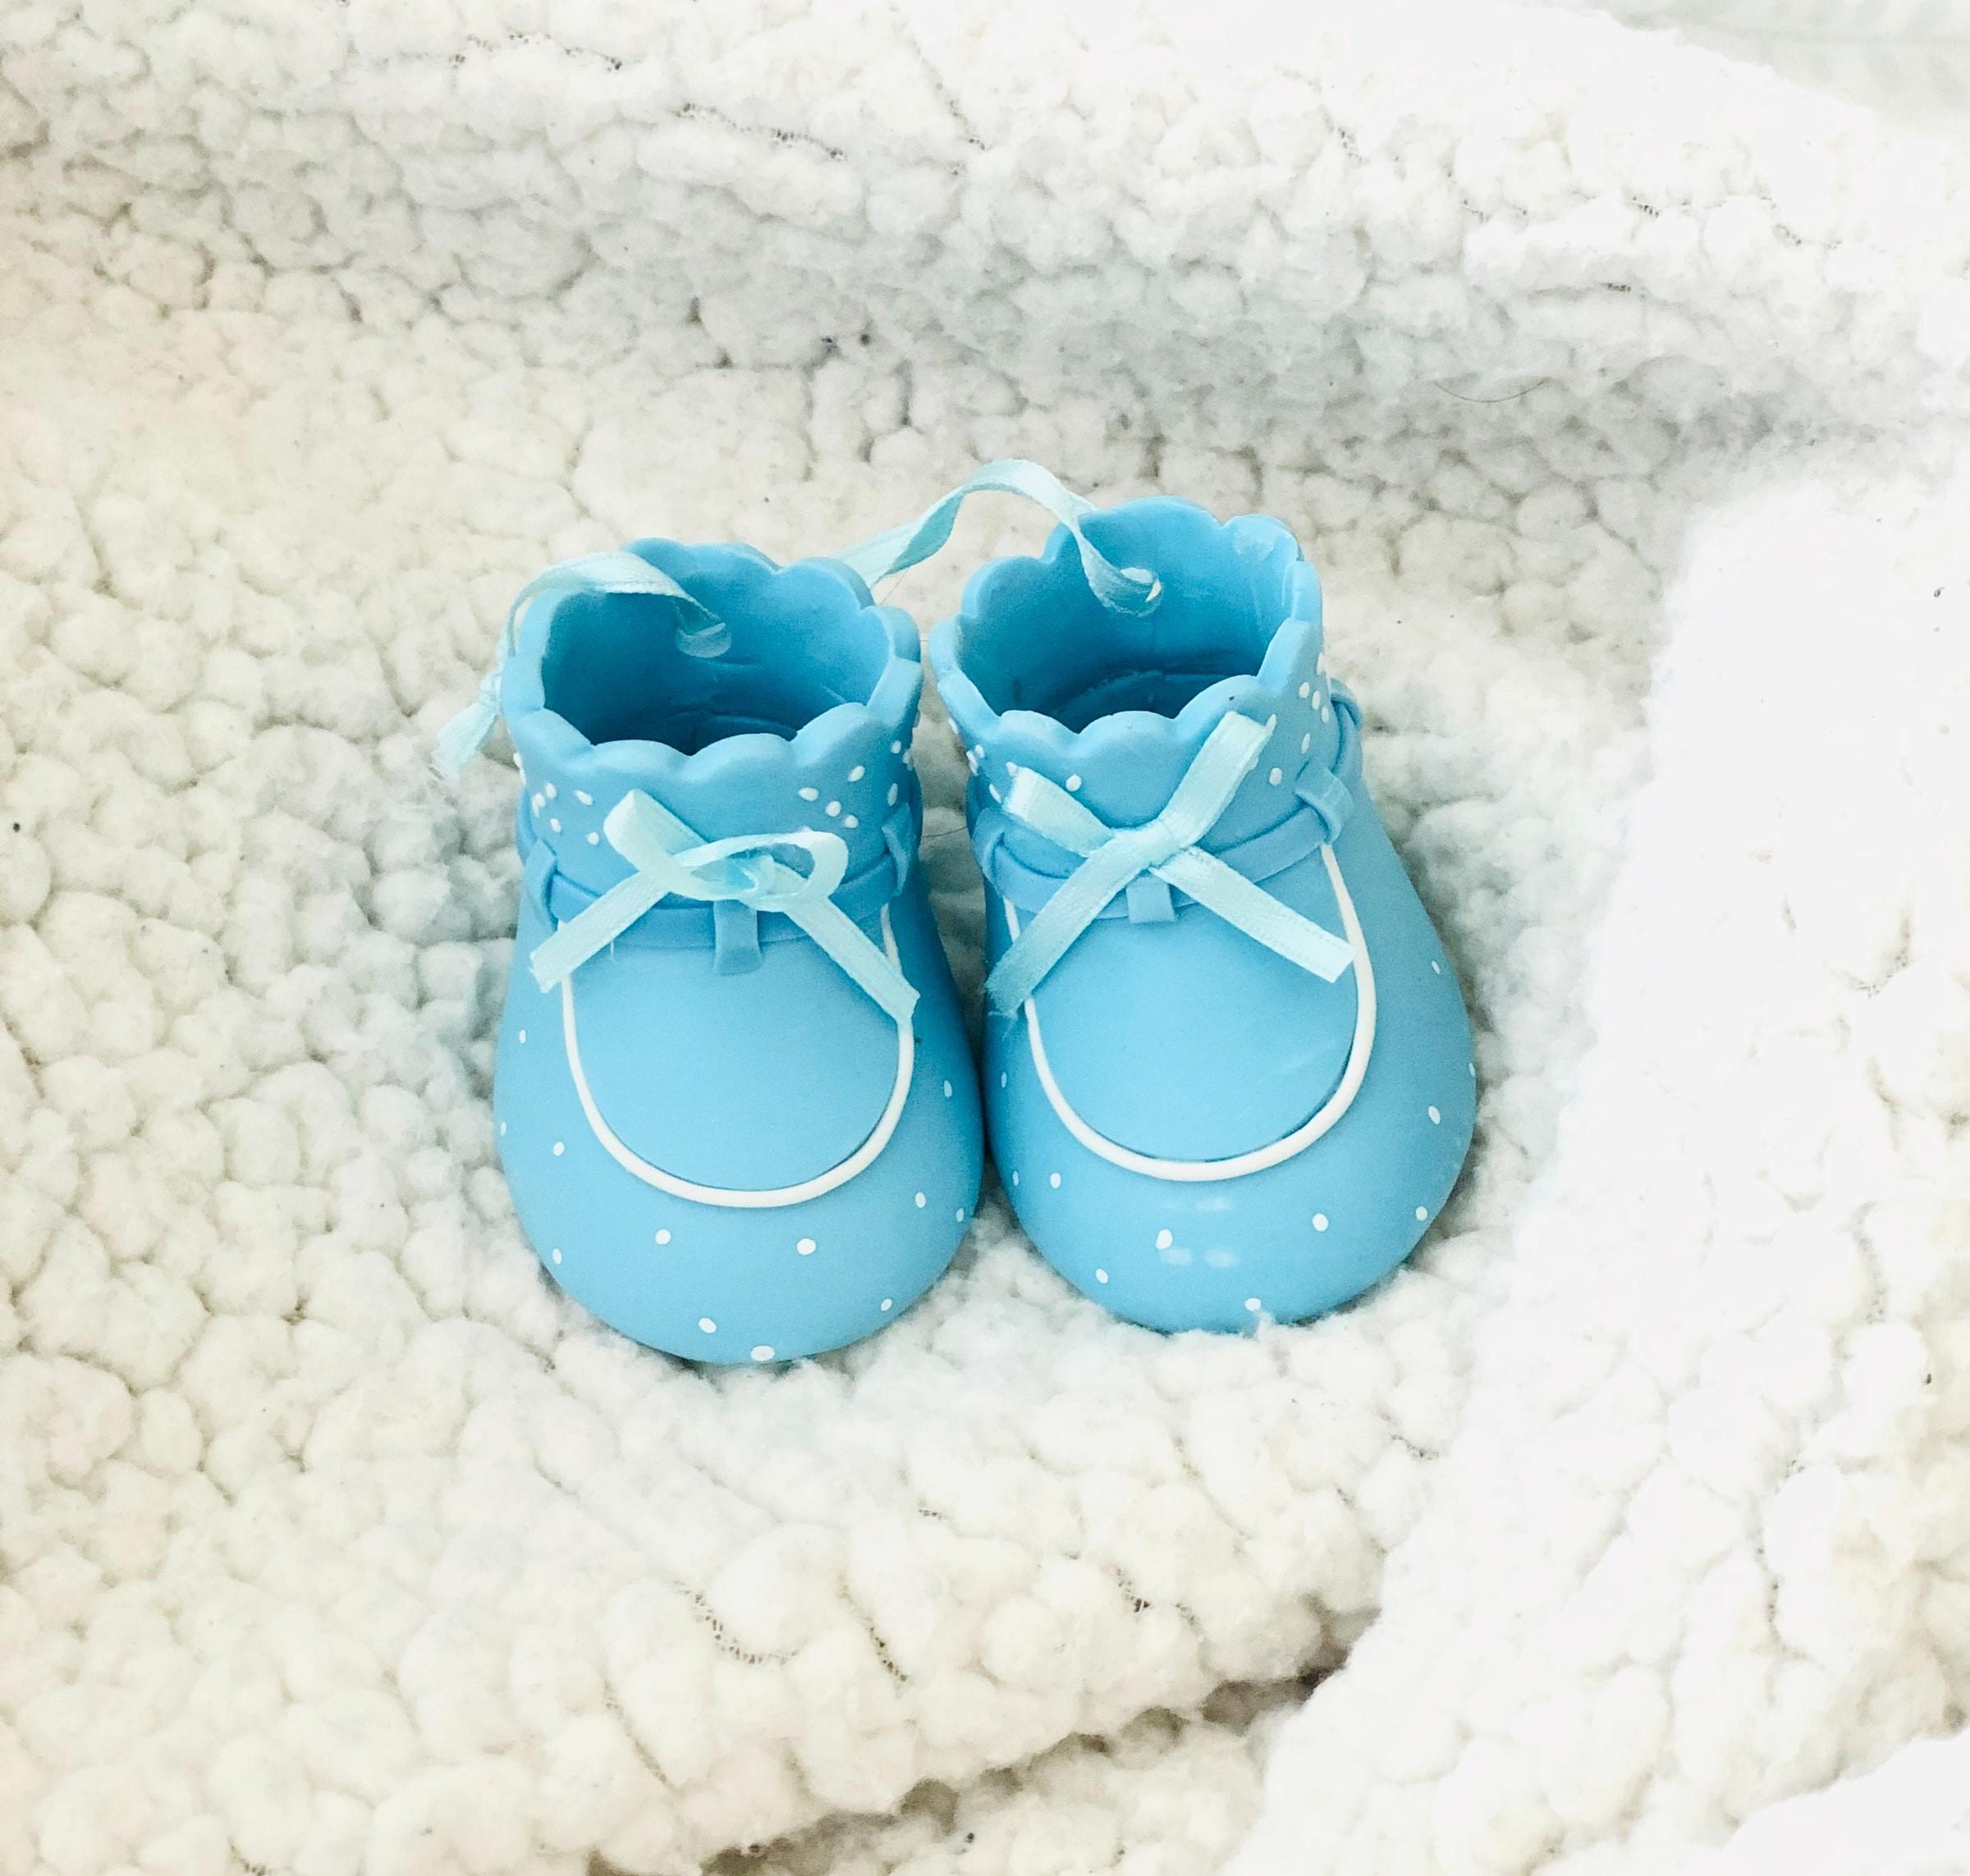 Ett par gulliga skor givna som en babyshower present